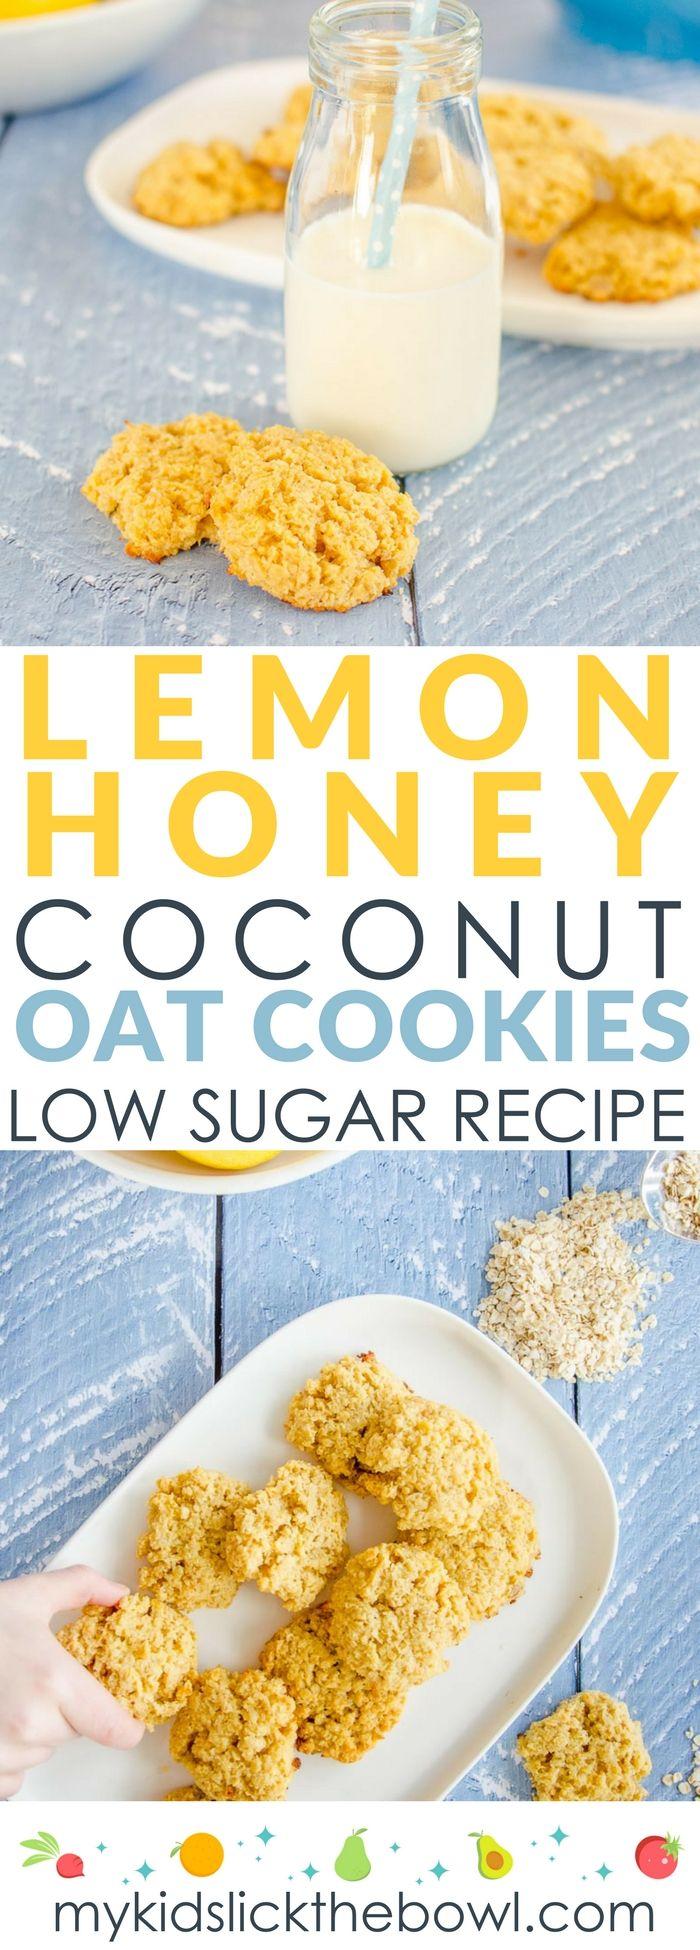 Lemon Coconut Oat Cookies - My Kids Lick The Bowl